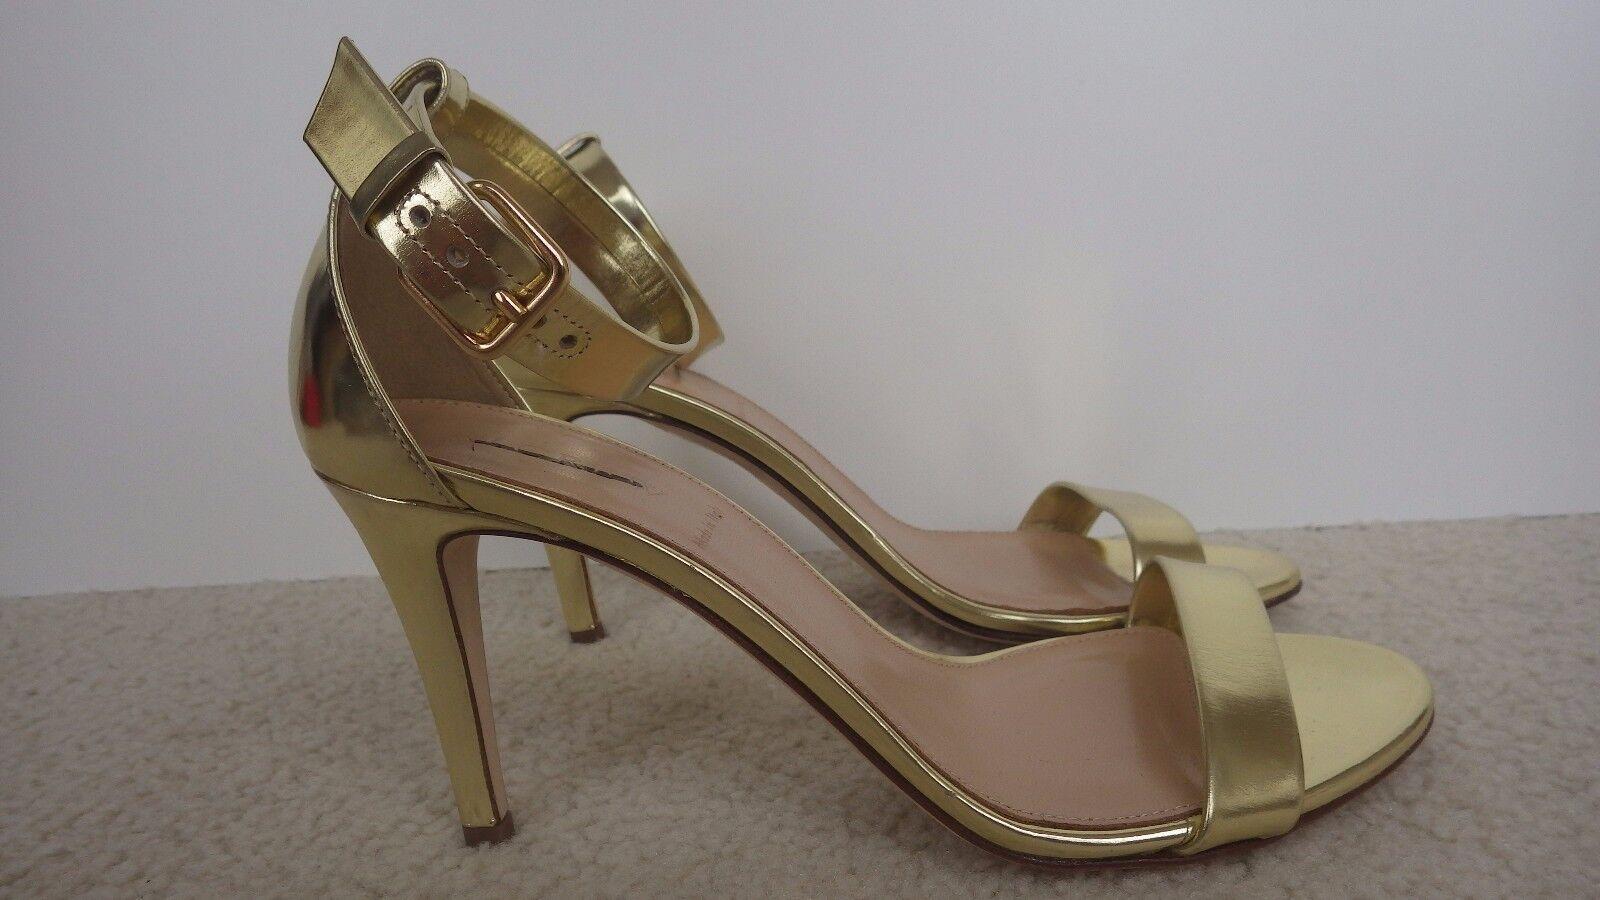 New Damens J.Crew Mirror Metallic High-Heel Sandale, Gold, Größe 9.5